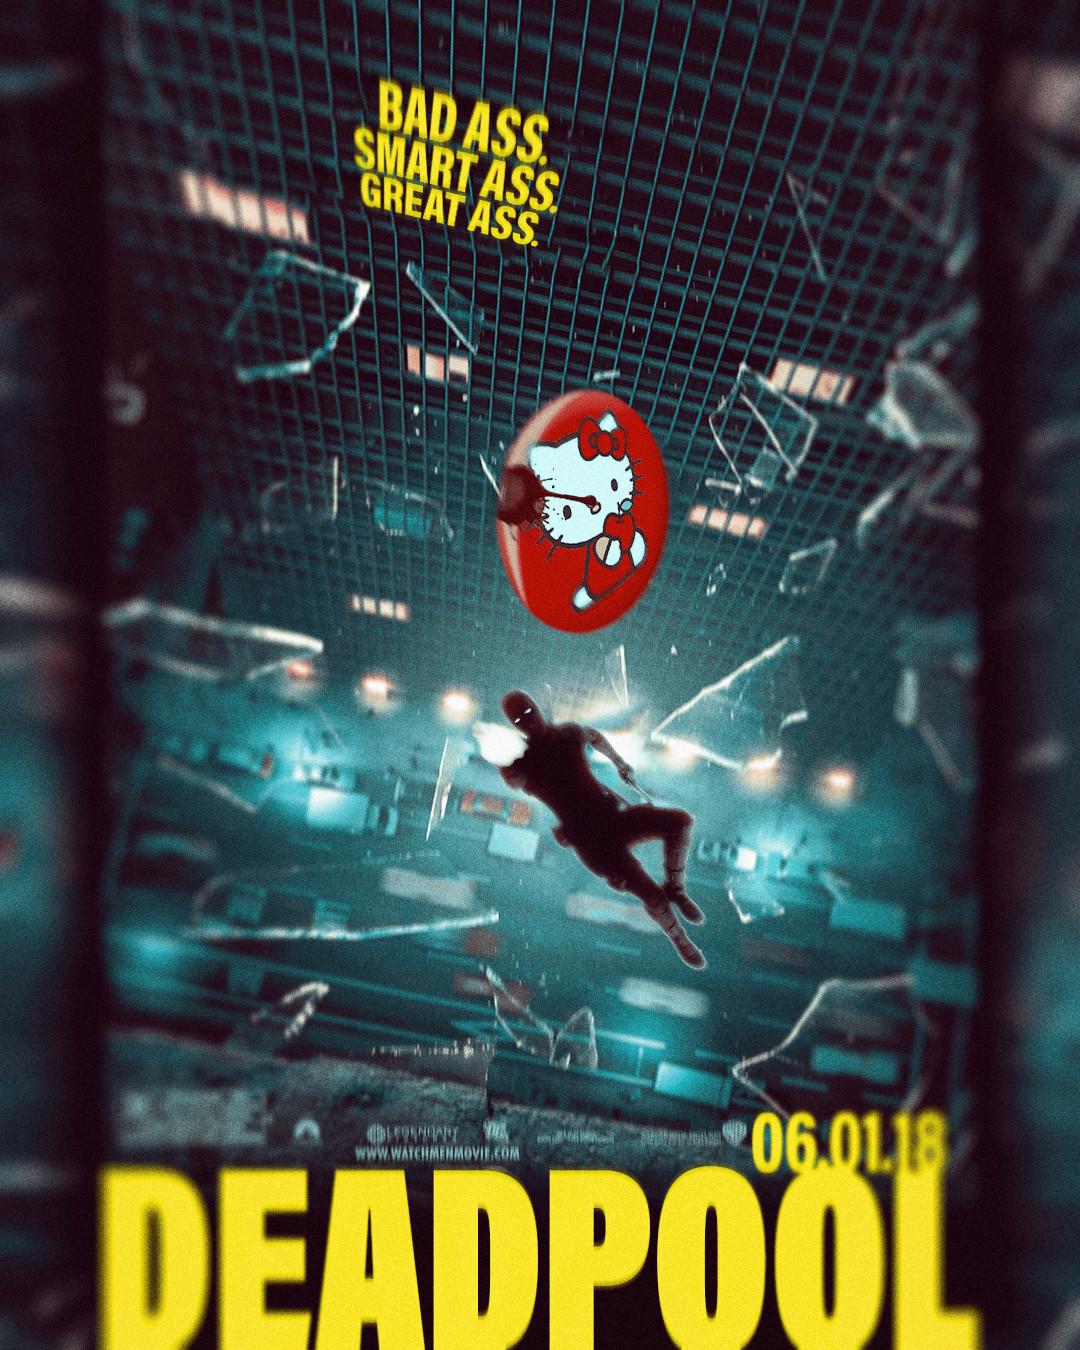 Deadpool remix